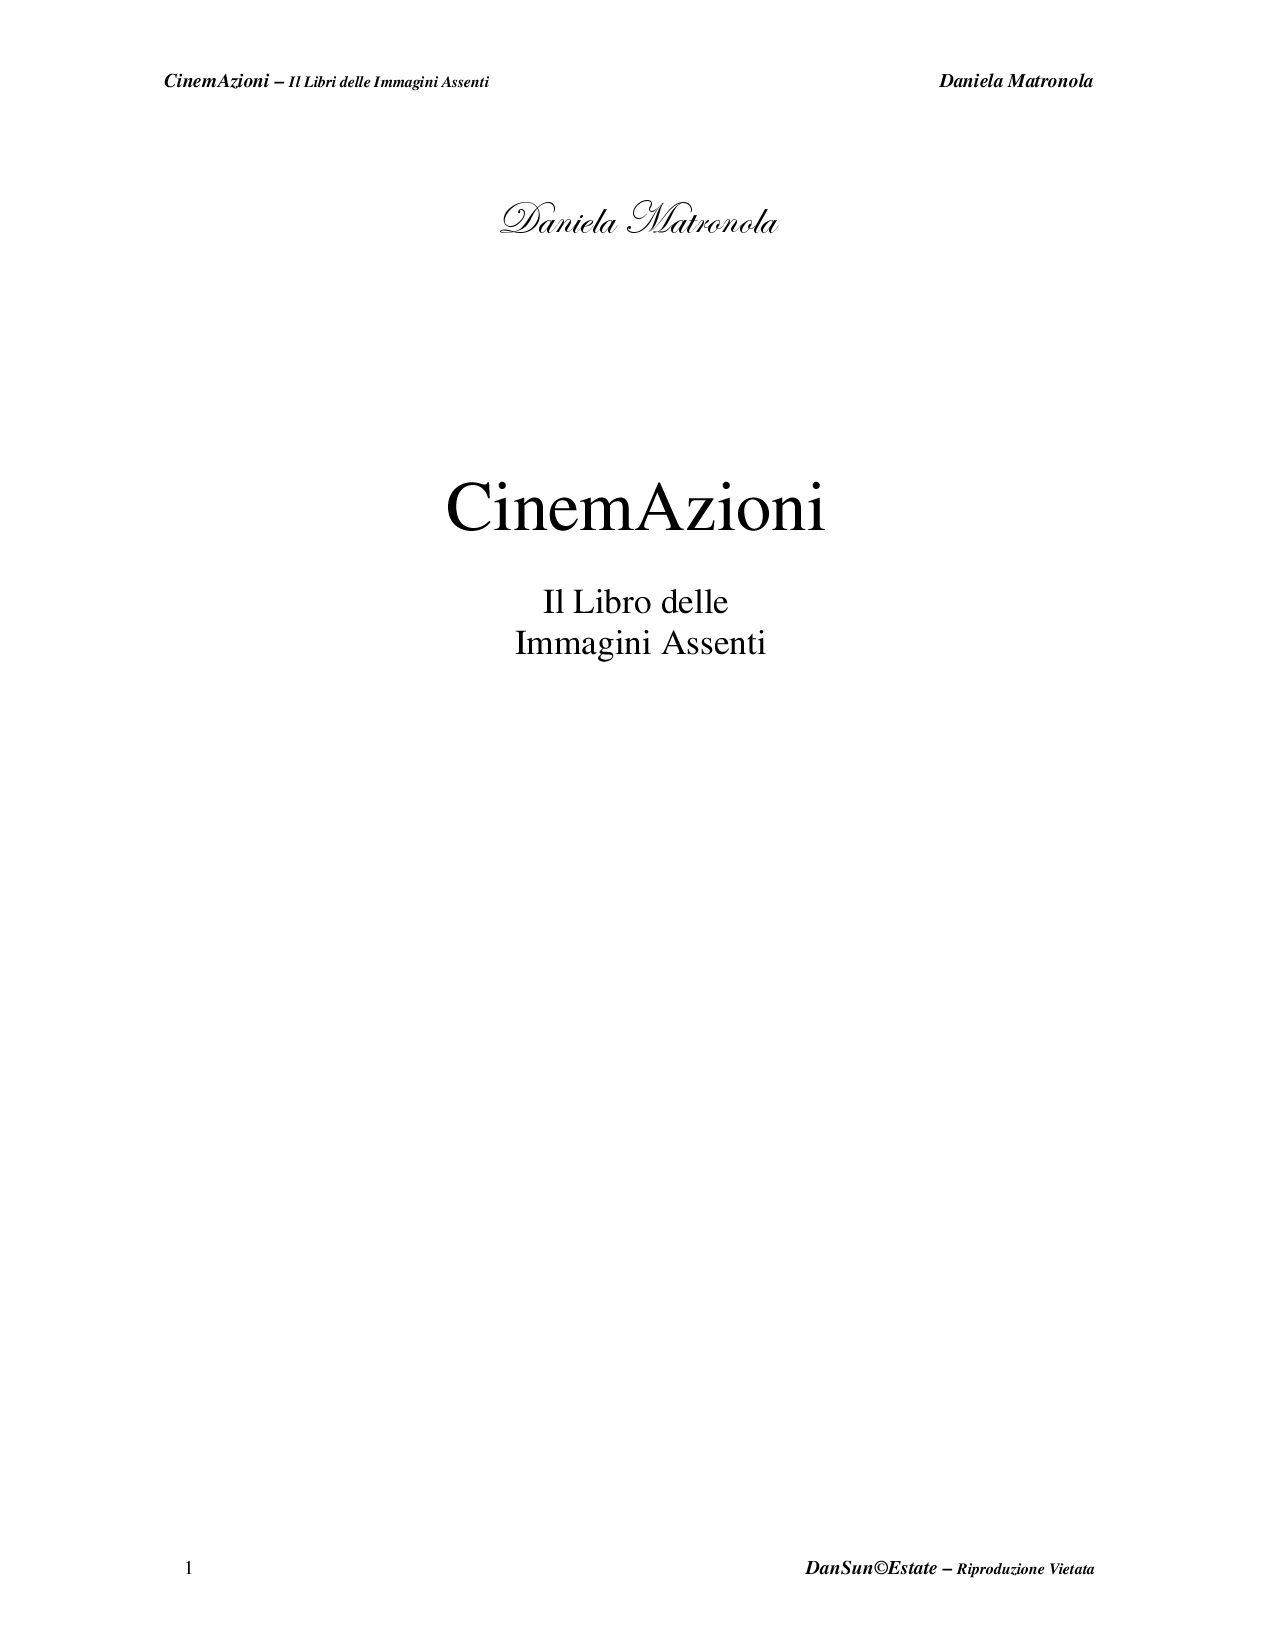 CinemAzioni by Daniela Matronola - issuu 9d3a3b6a88b6